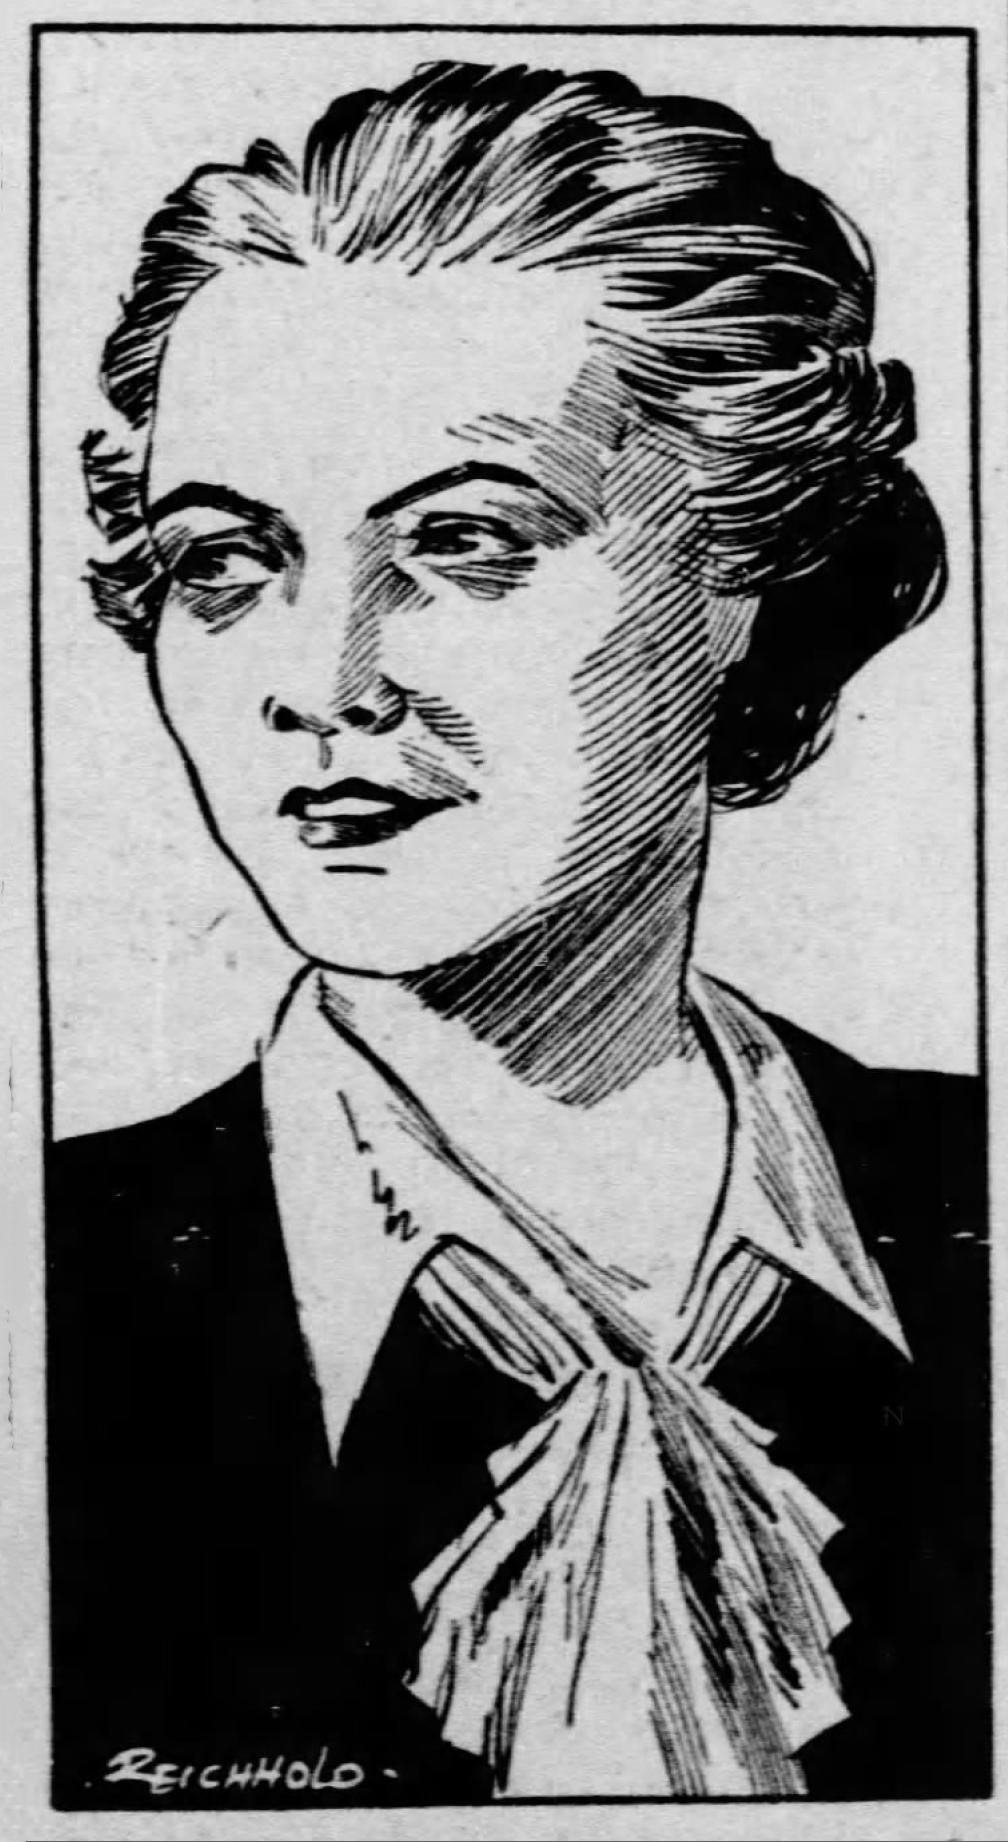 RWL 1938 newspaper sketch.